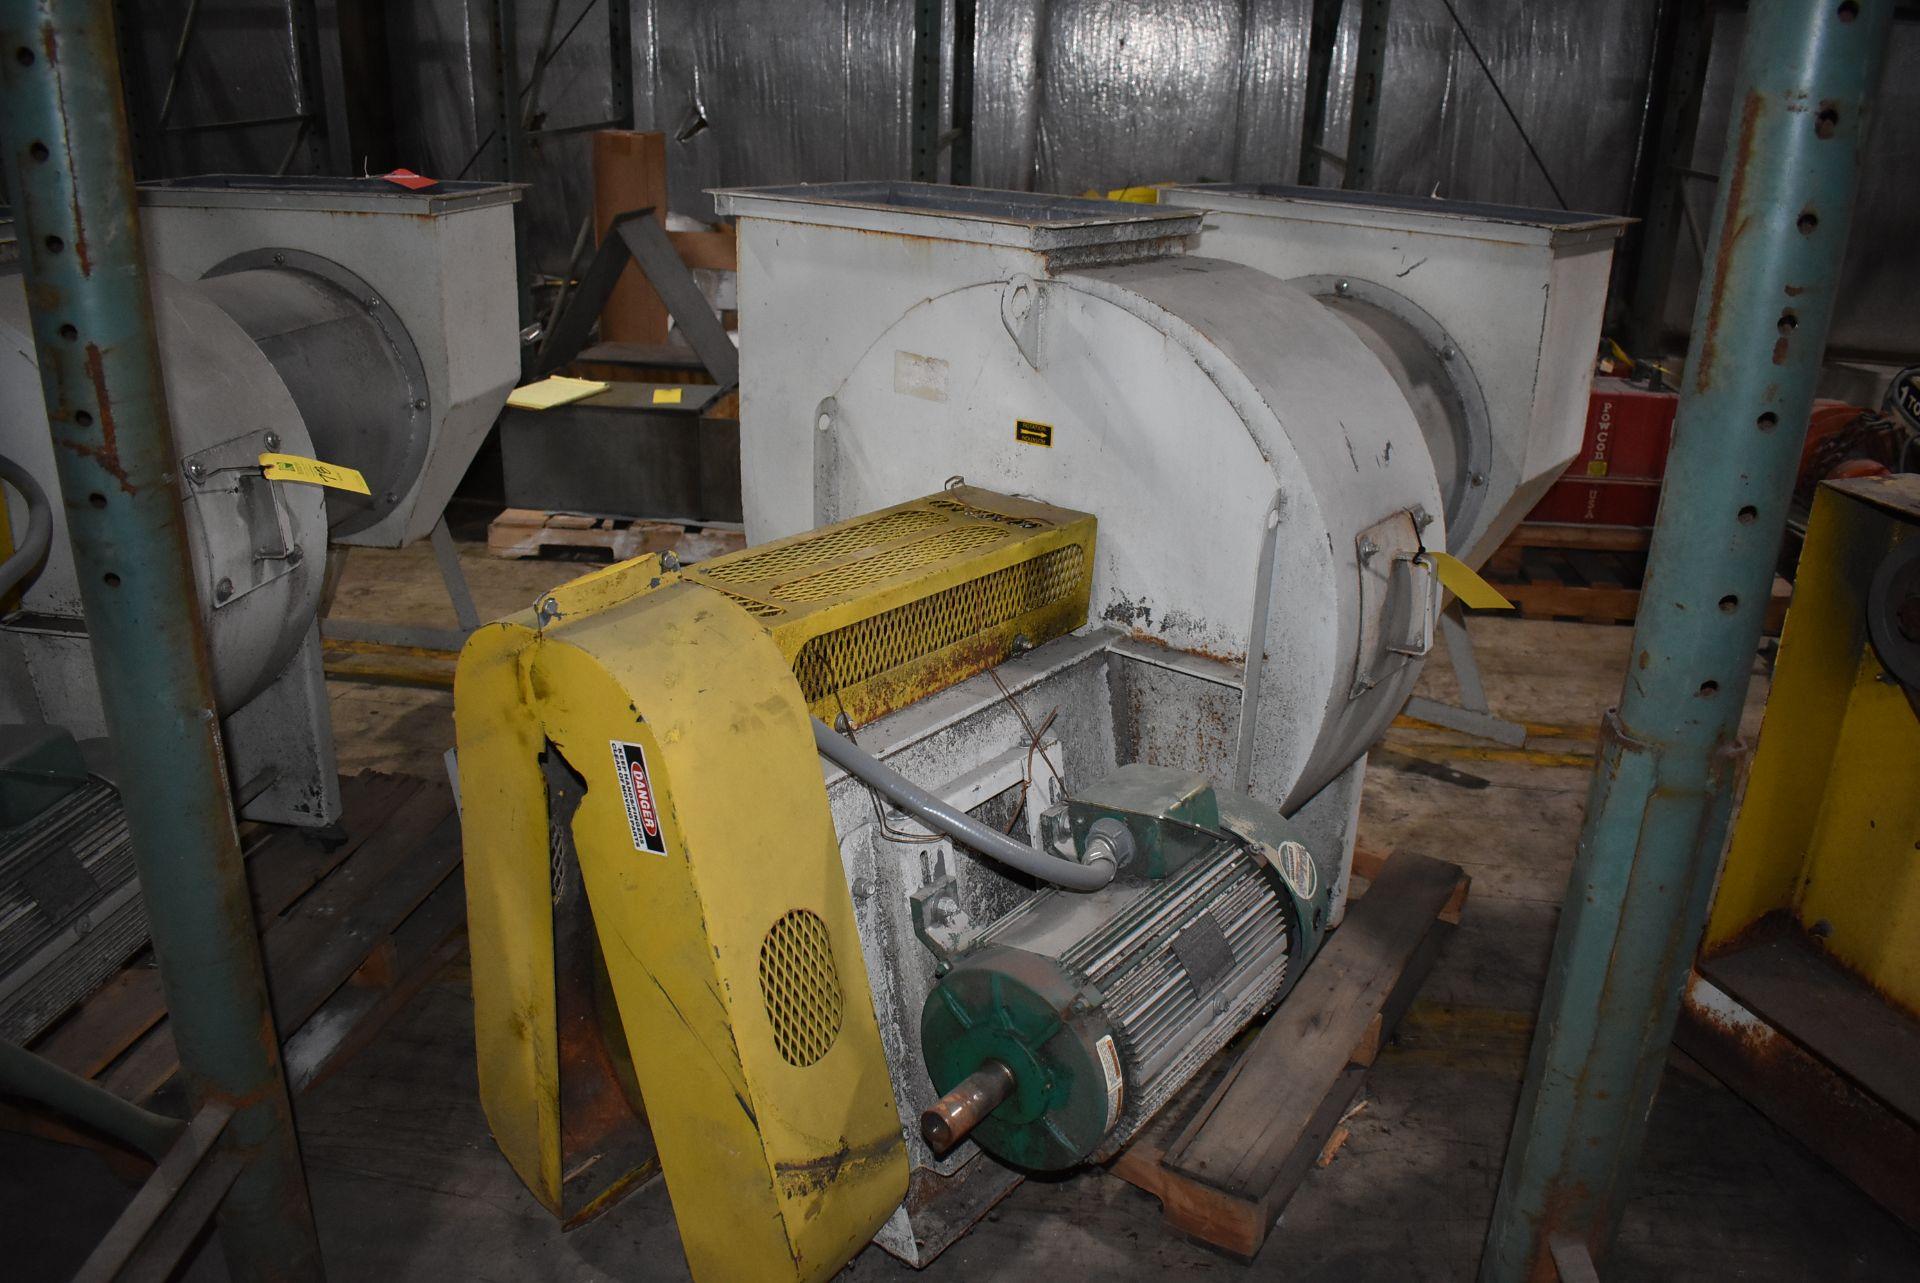 IAP Inc. Model #222-50-D Blower w/Marathon 20 HP Motor - Image 3 of 3